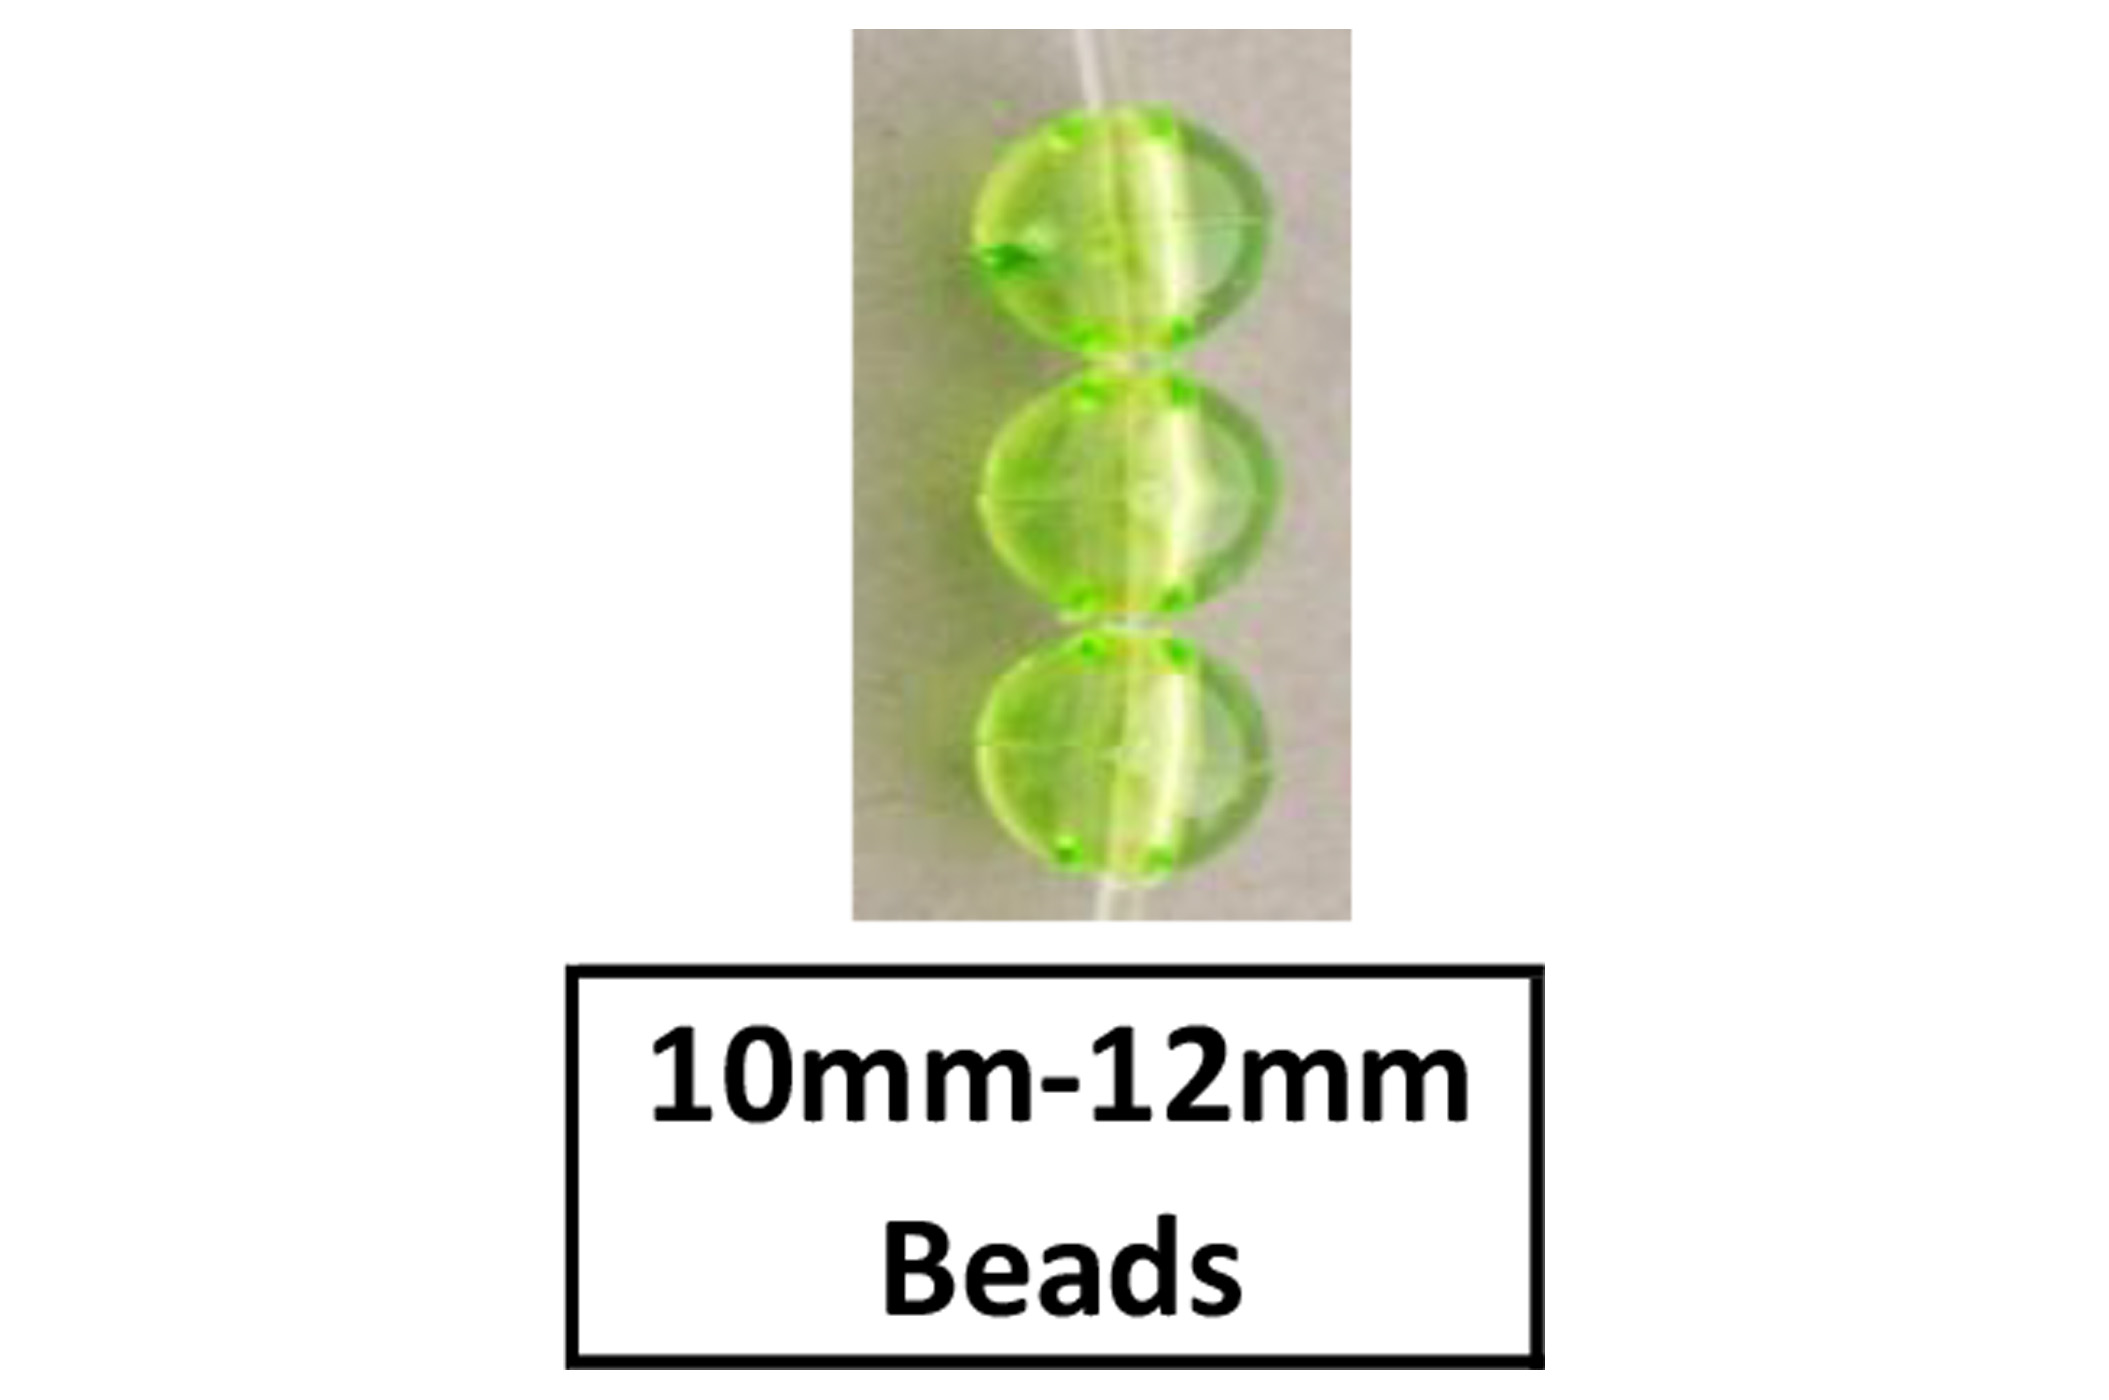 10-12mm bead